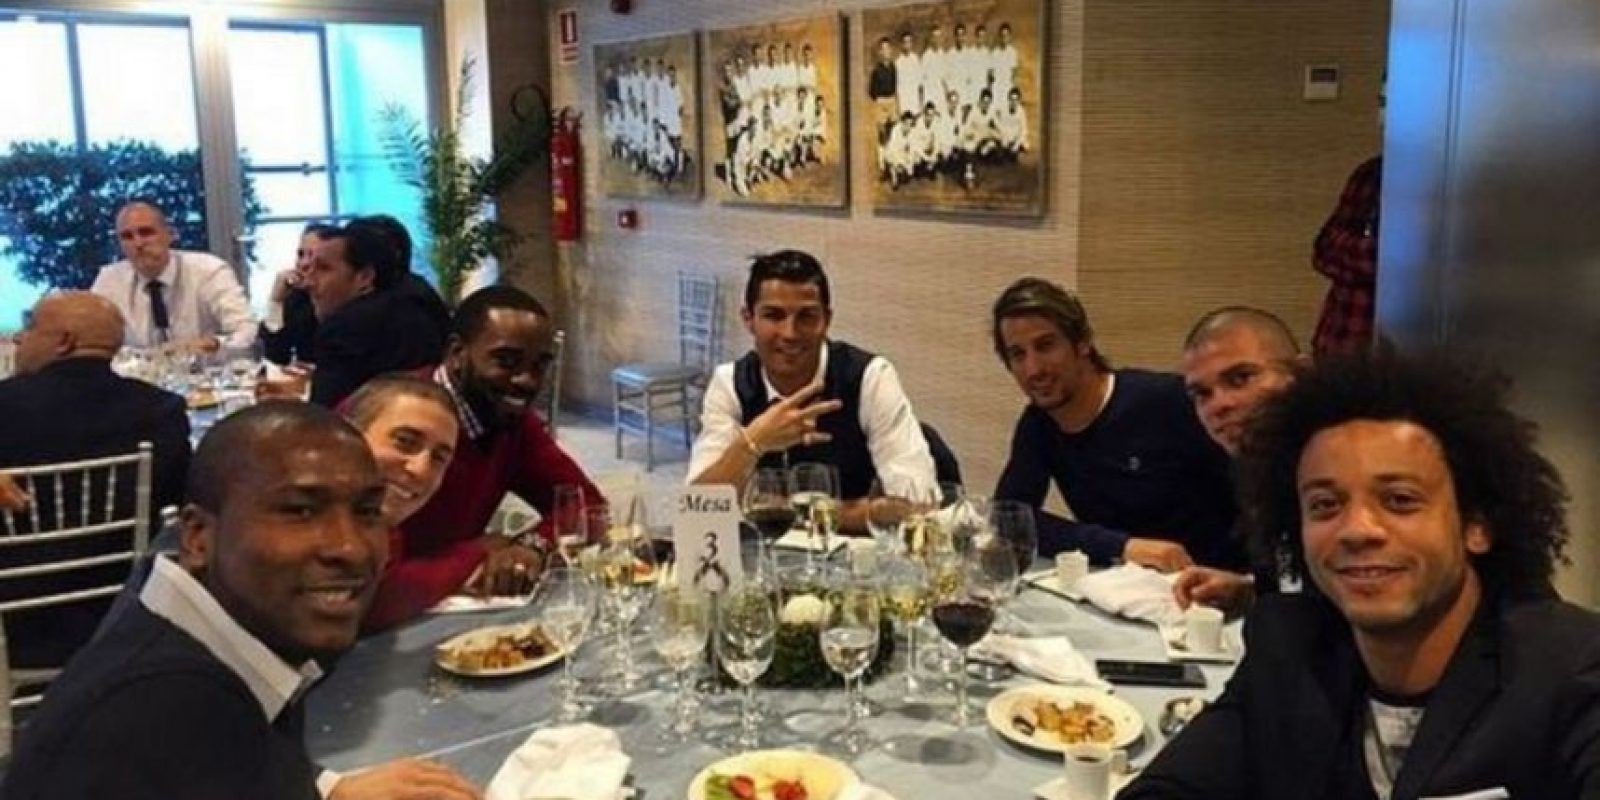 La comida navideña del Real Madrid Foto:Twitter: @realmadrid